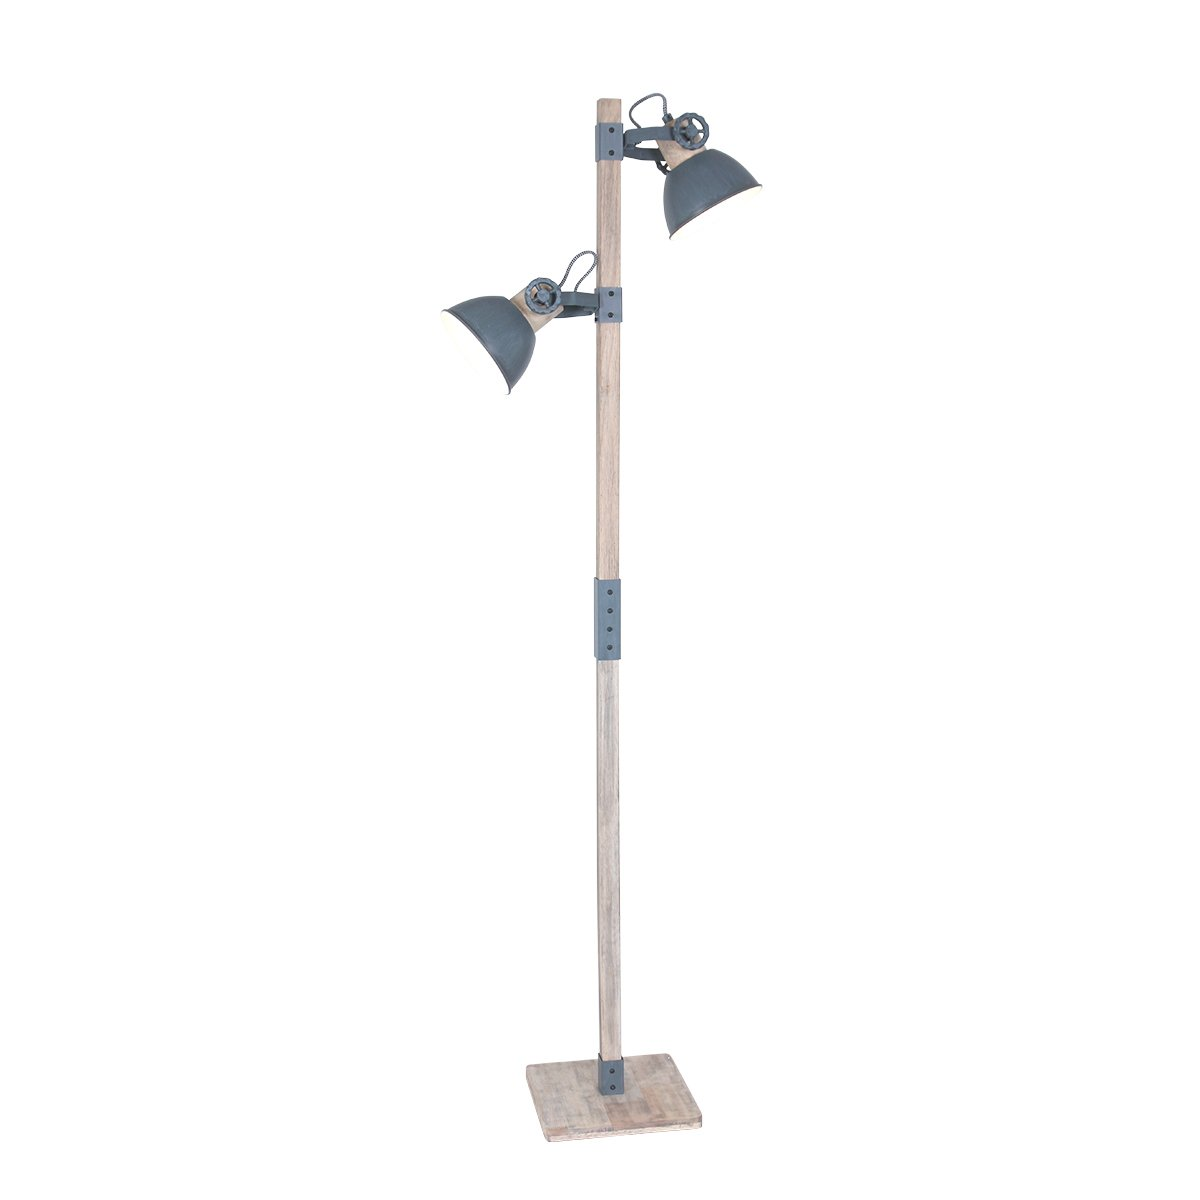 Vloerlamp Steinhauer Gearwood Grijs